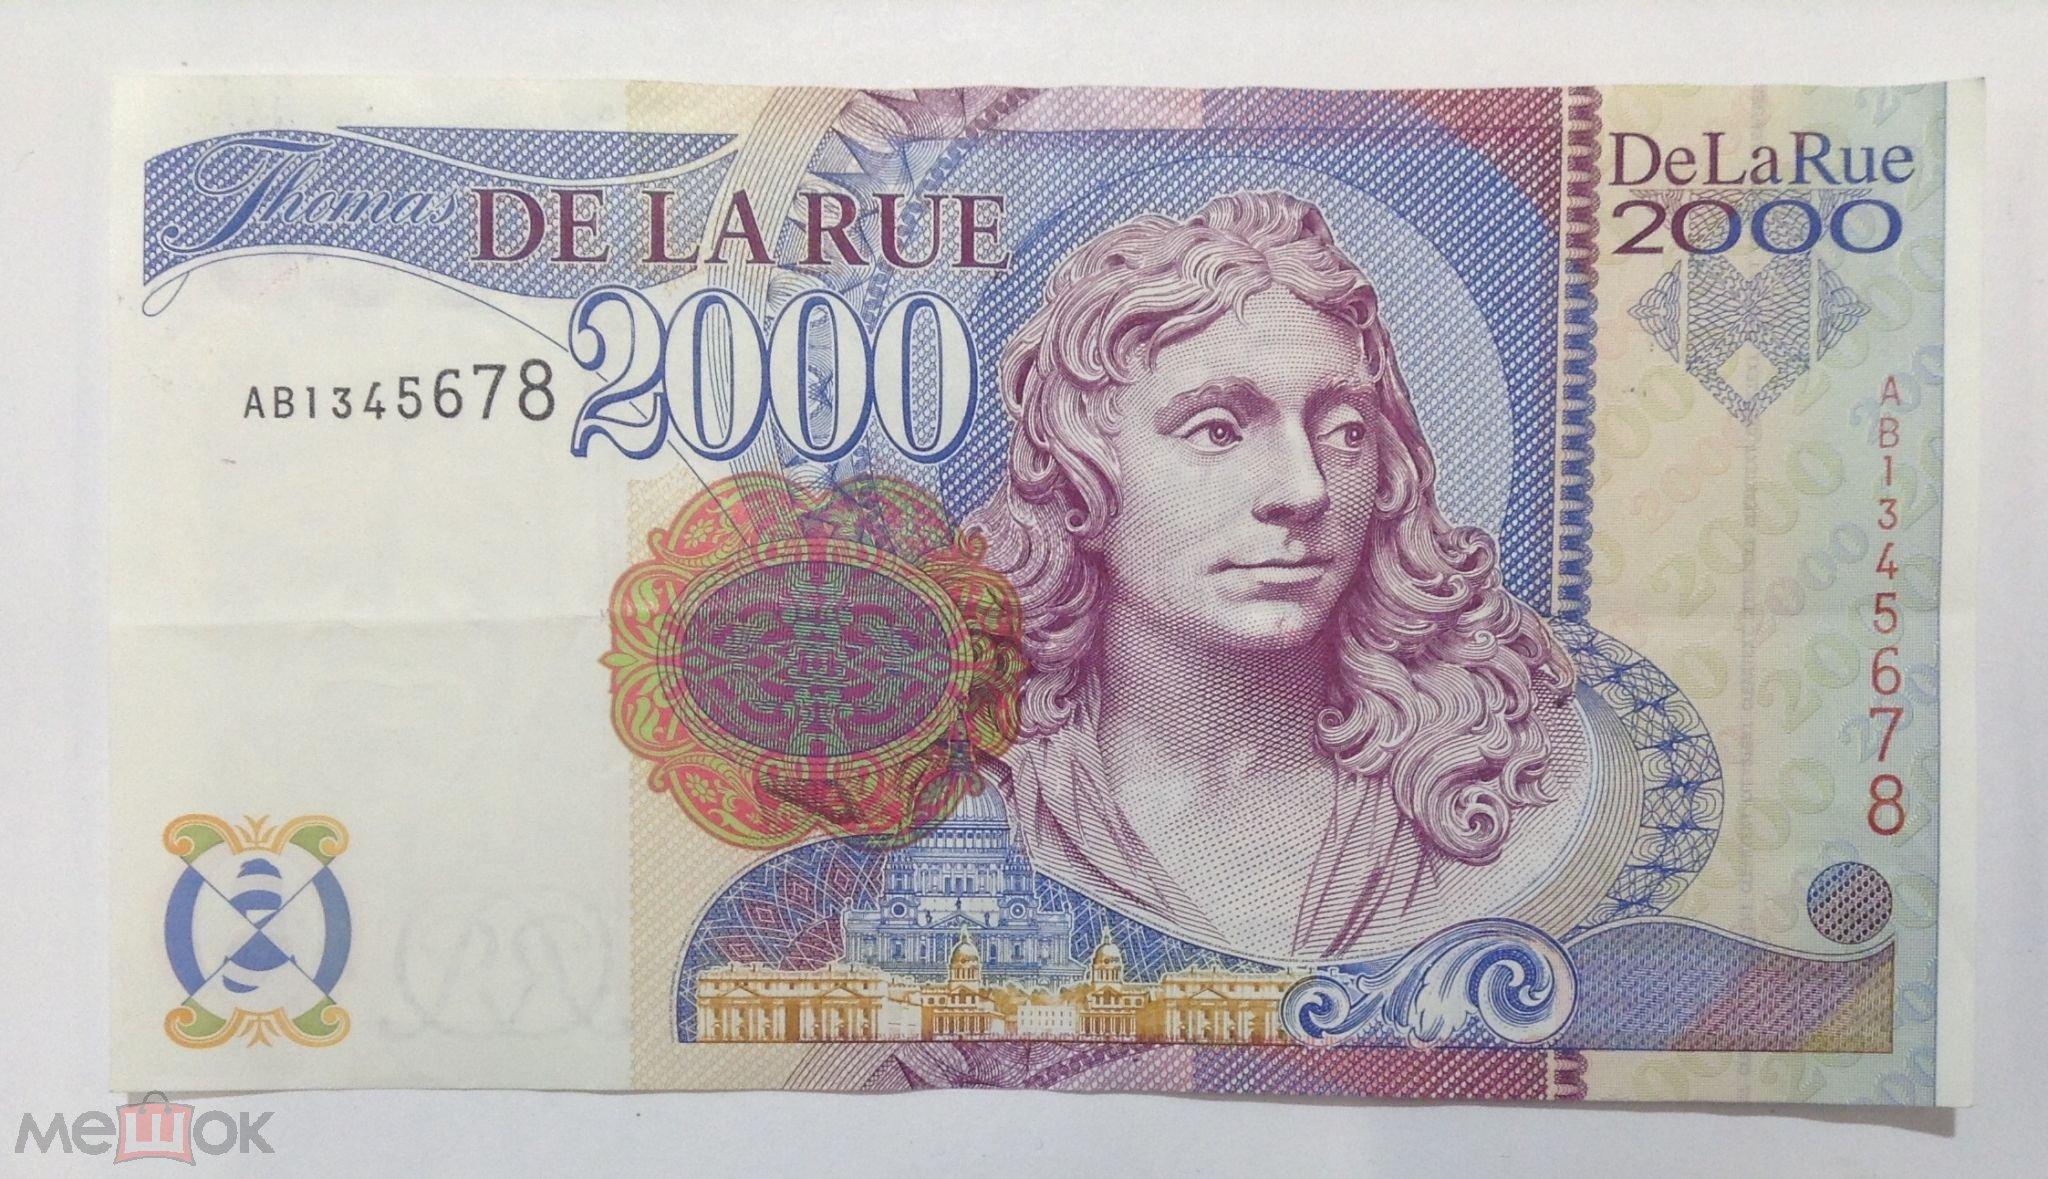 2000 De La Rue тестовая бона в состоянии